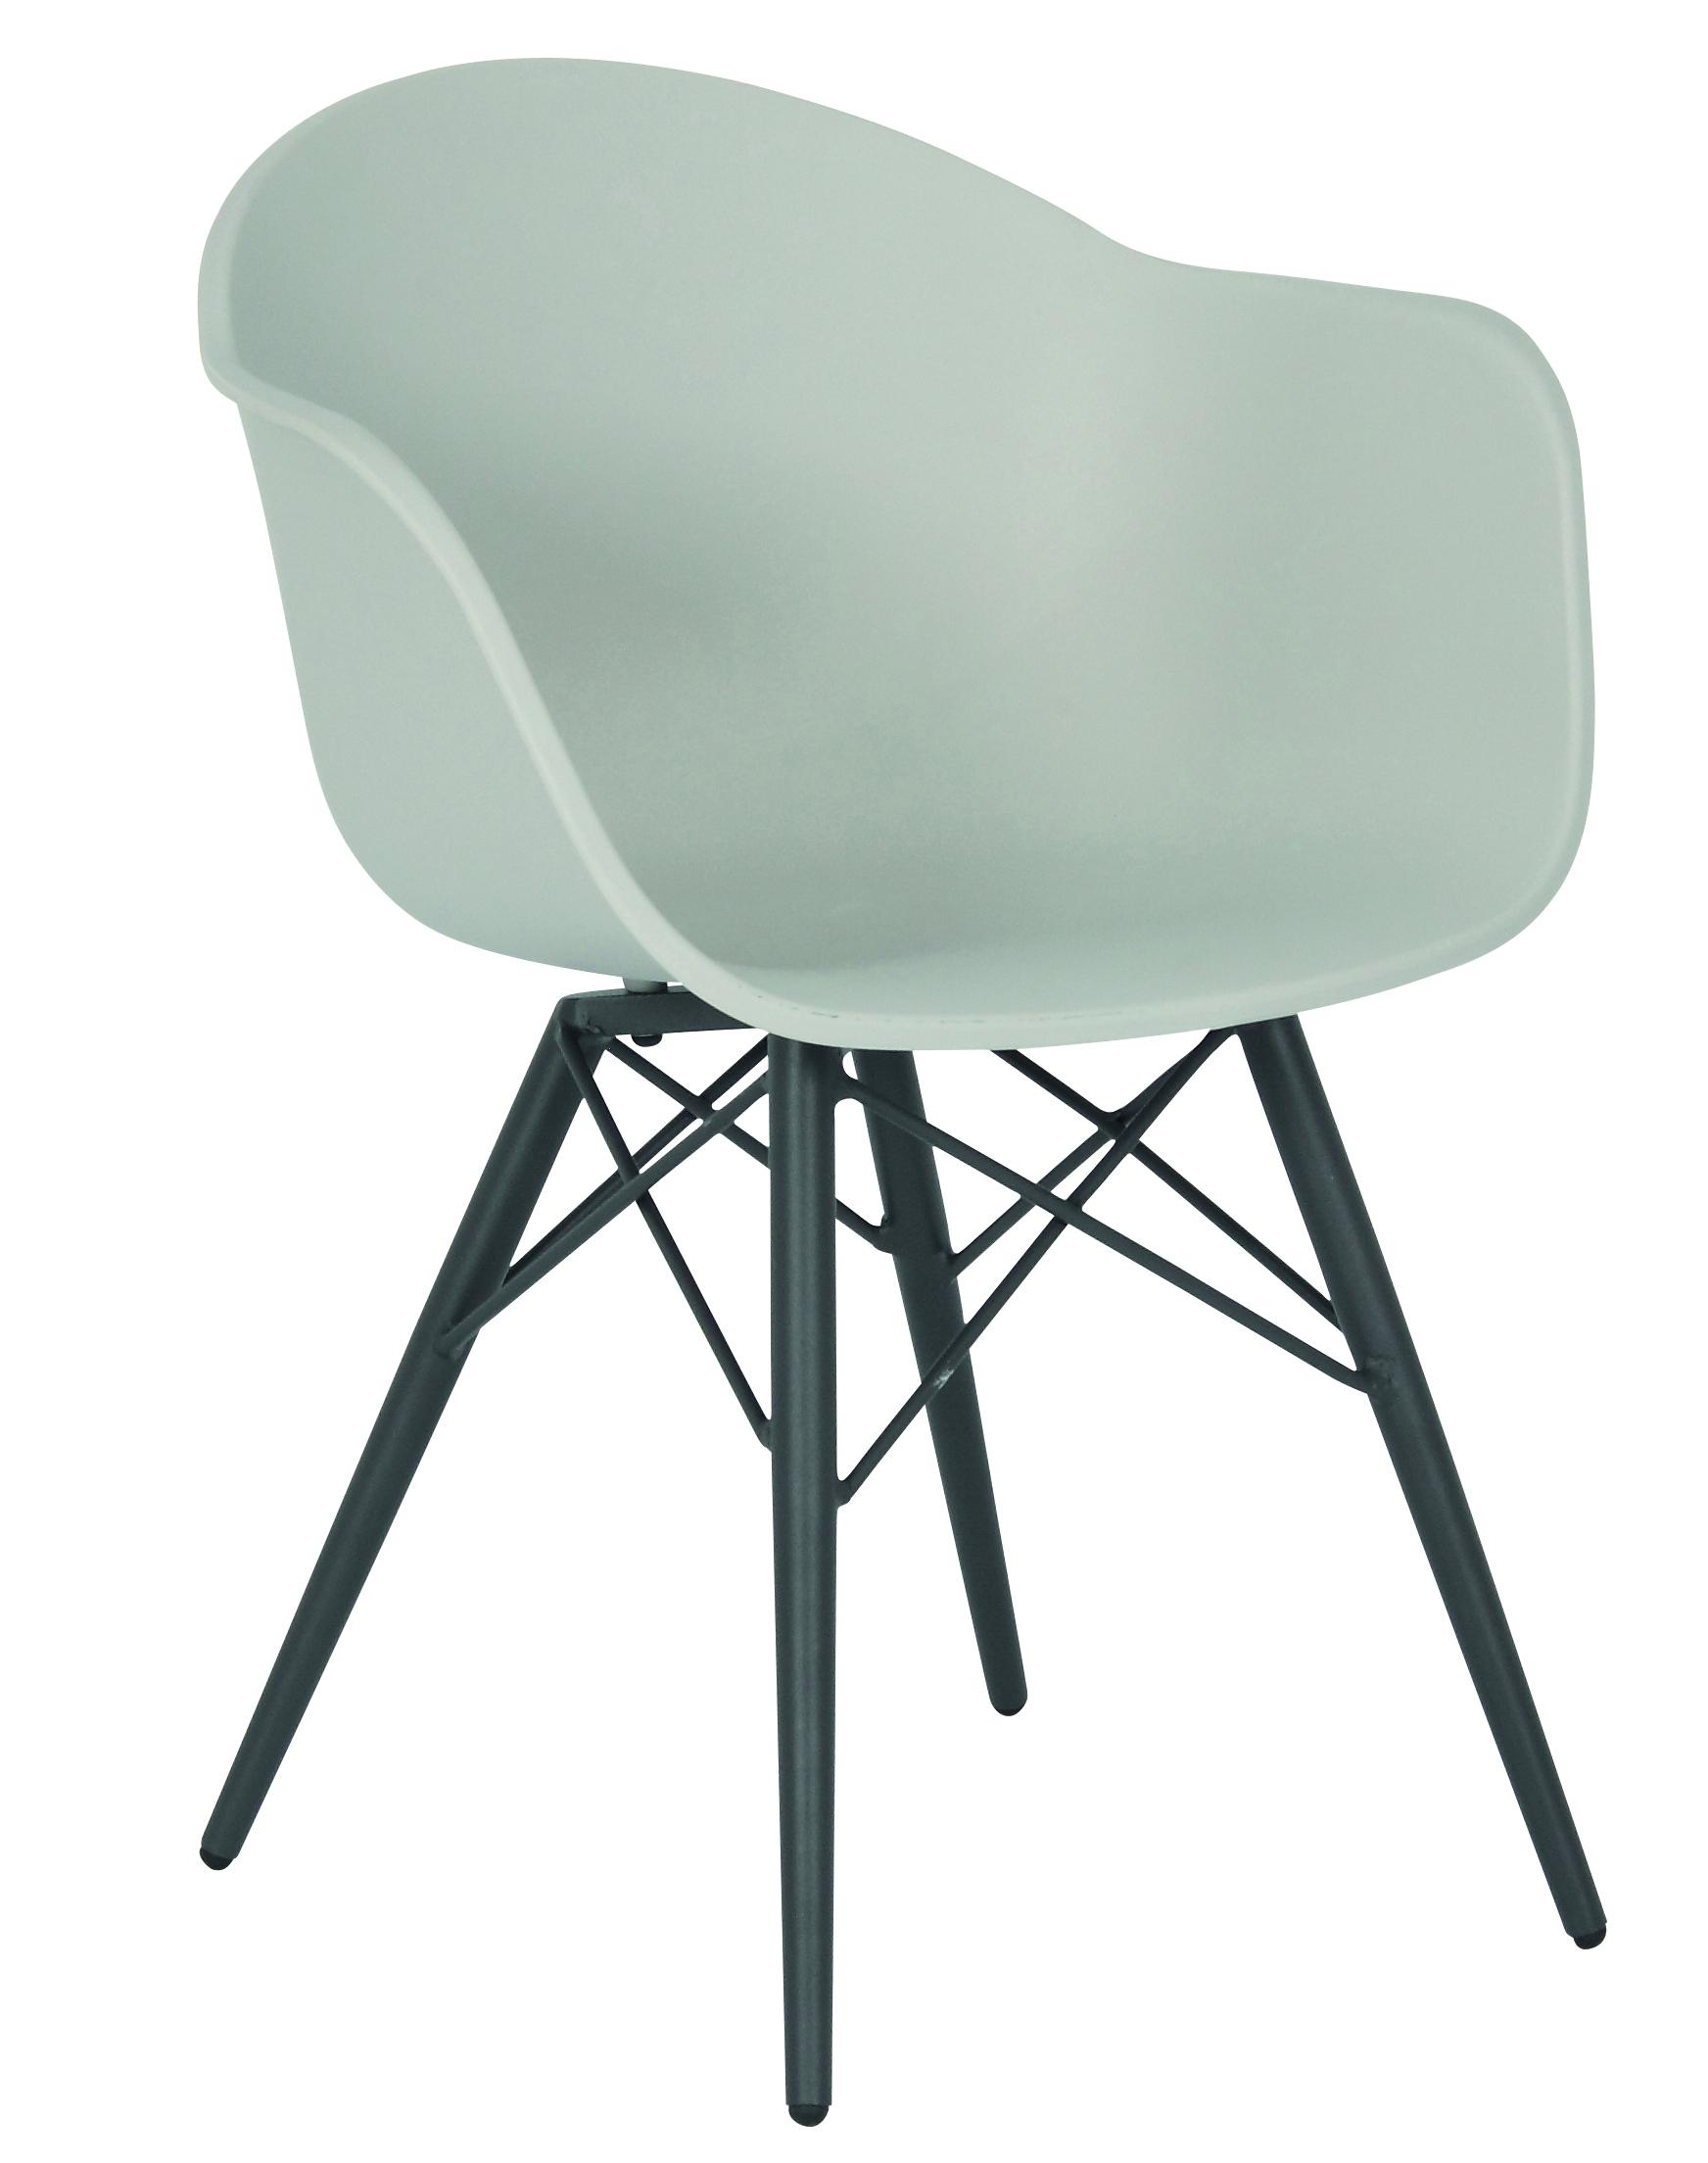 Acamp Gartensessel Schalensessel New York Gartenstuhl Stuhl Grau Stühle 2er Set